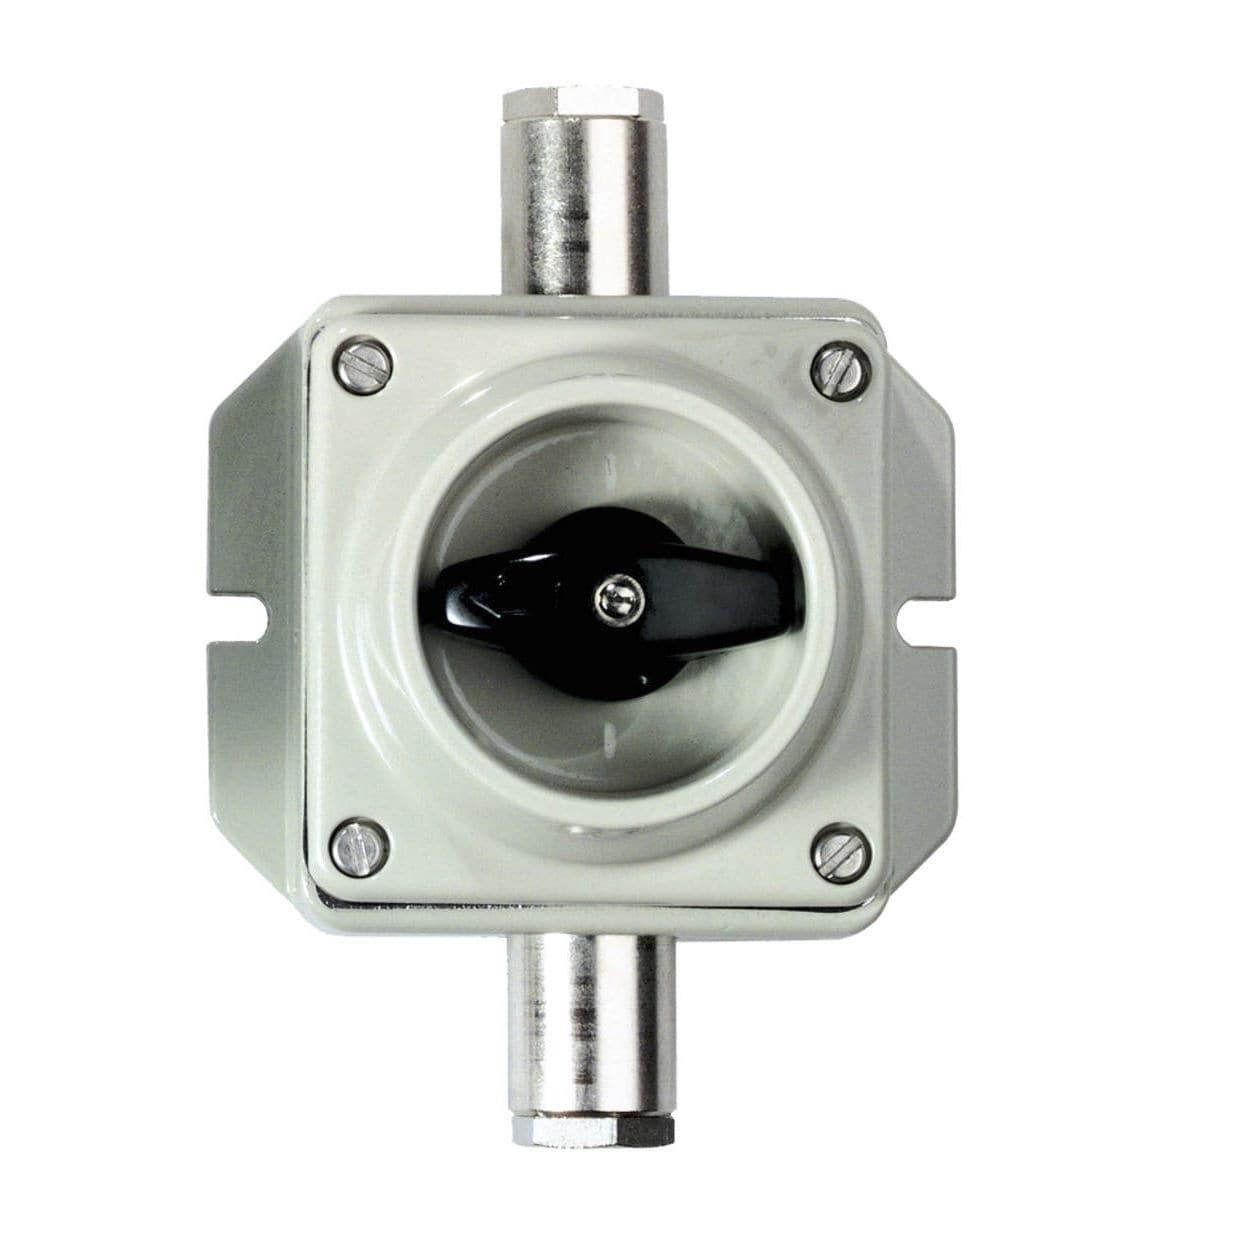 Rotary switch / 2-pole / on/off / aluminum - 75212 series - WISKA ...